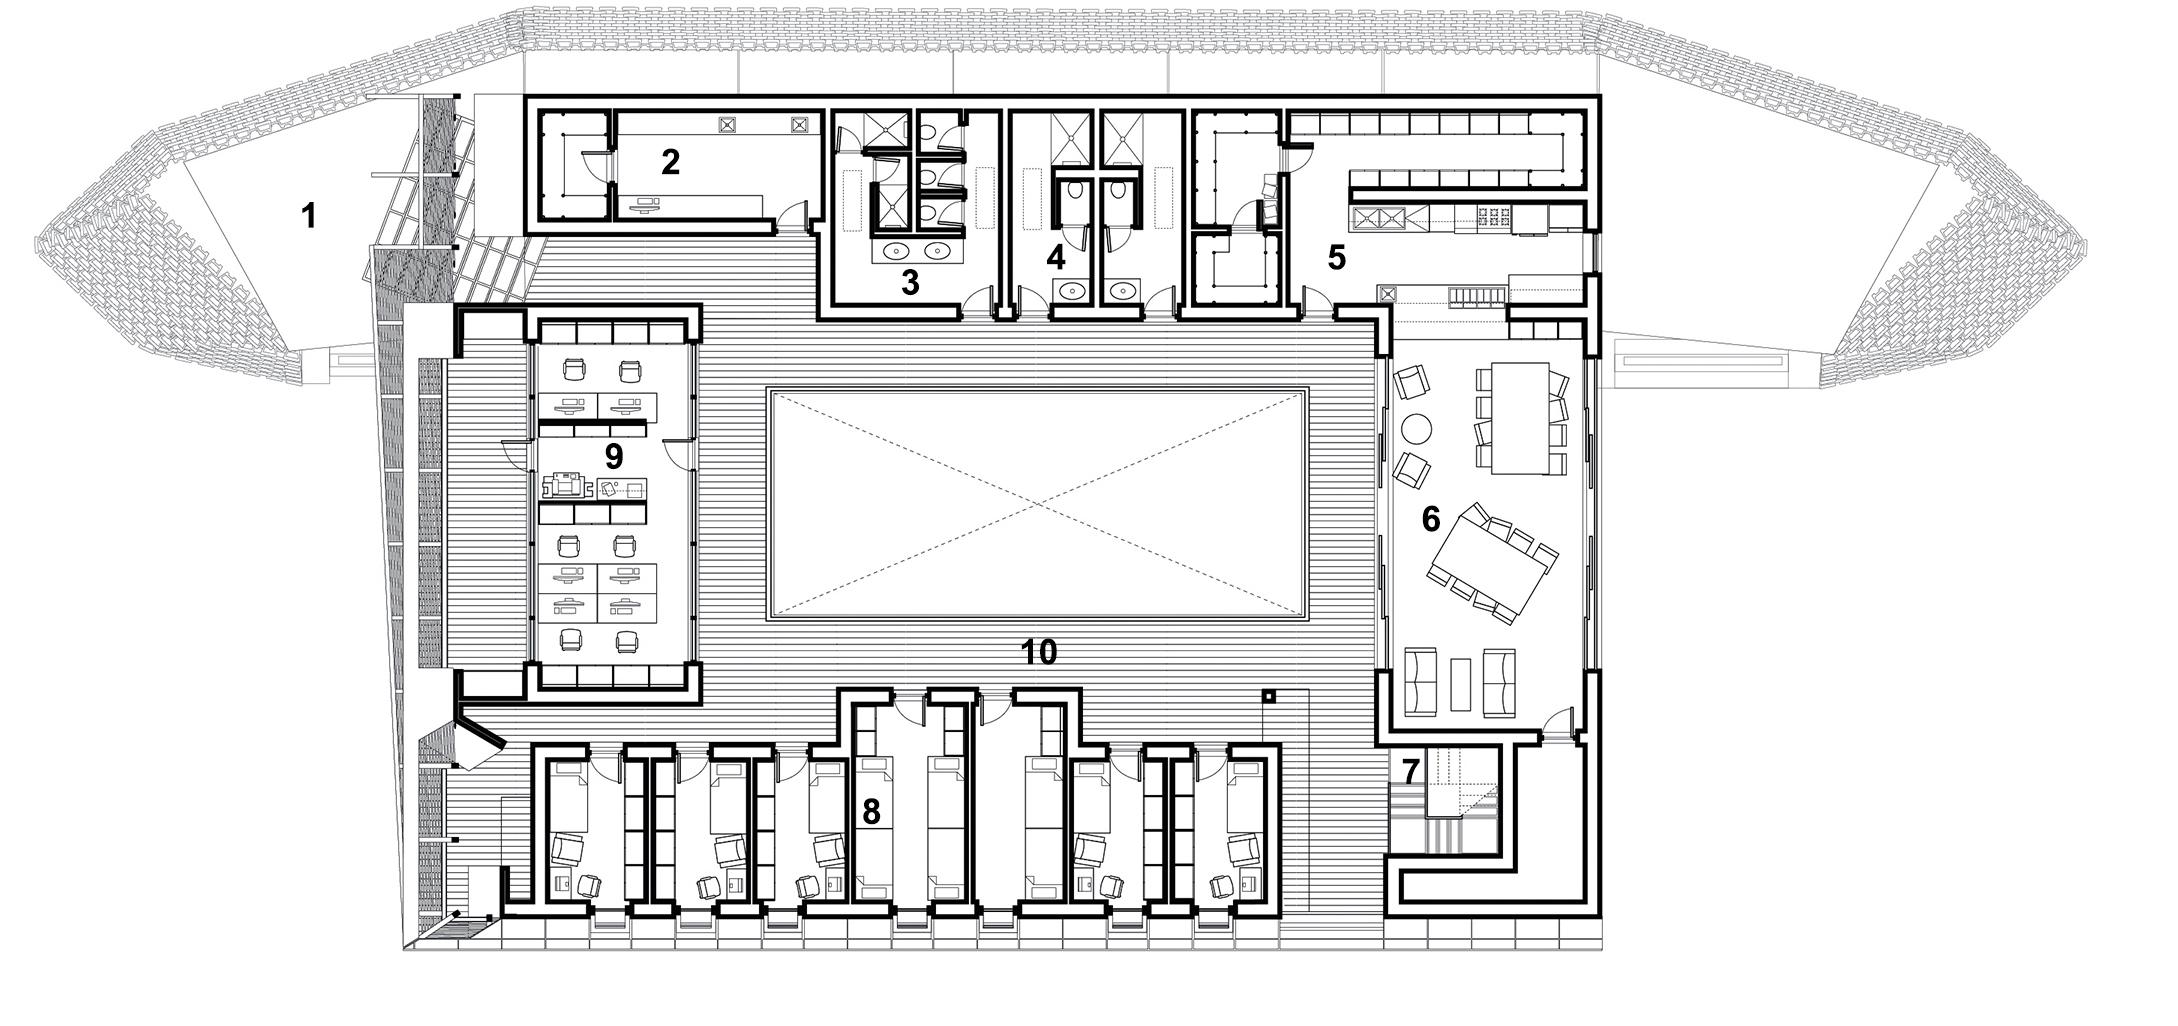 Main Station plan